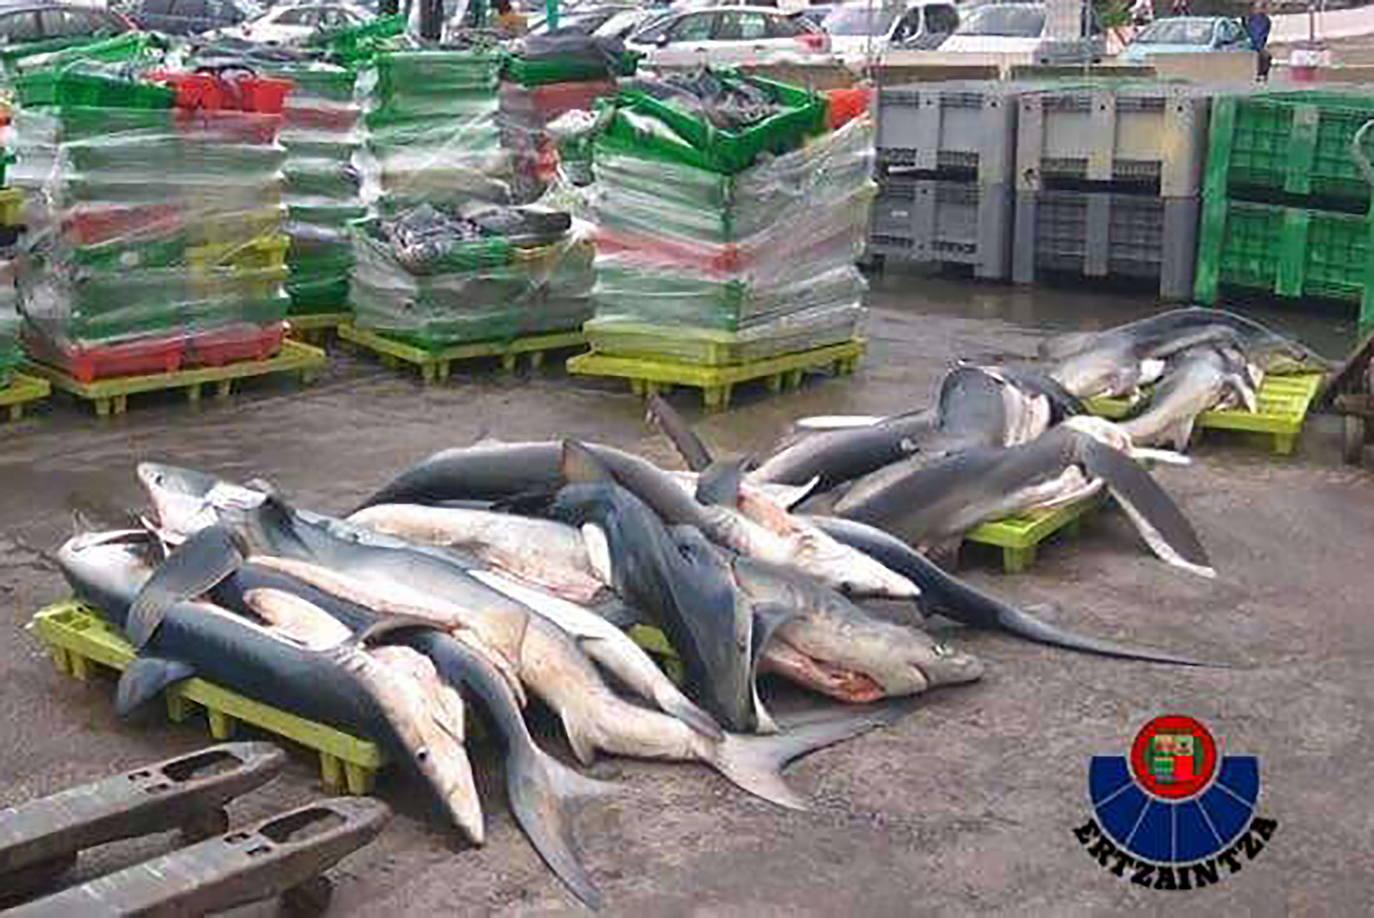 Eguzki de Ondarroa censura que delitos ecológicos como la pesca ilegal de marrajo 'salen baratos'